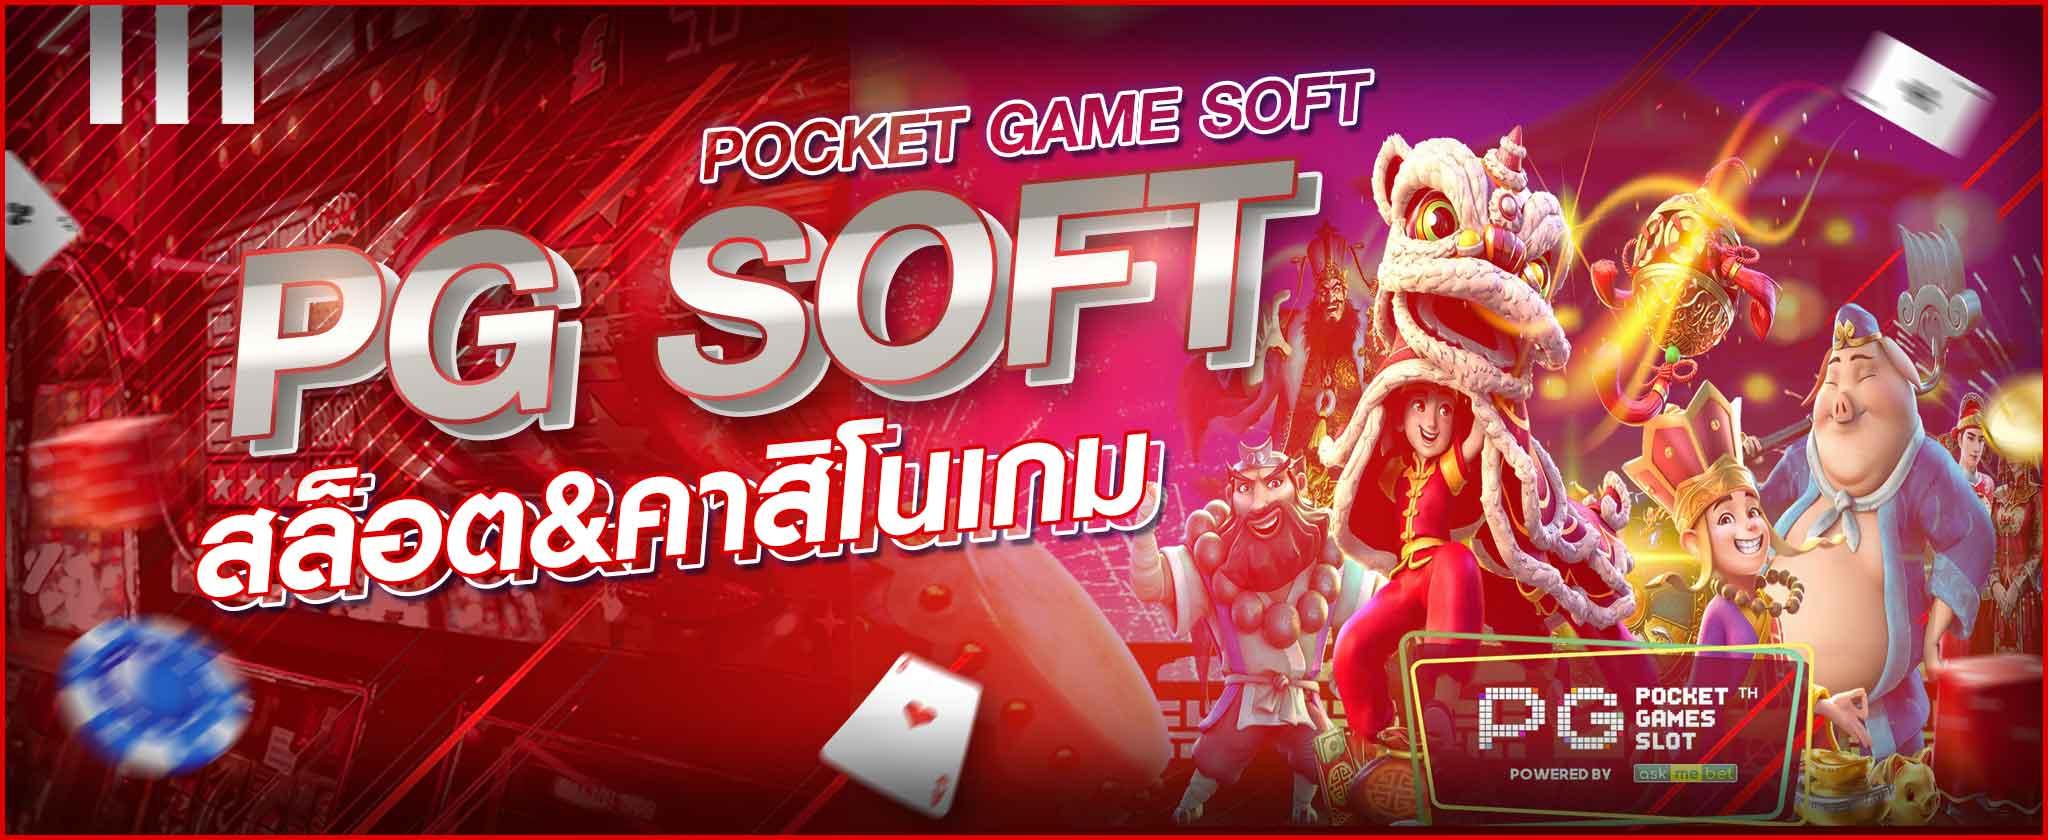 pg pocket games slot ทางเข้า